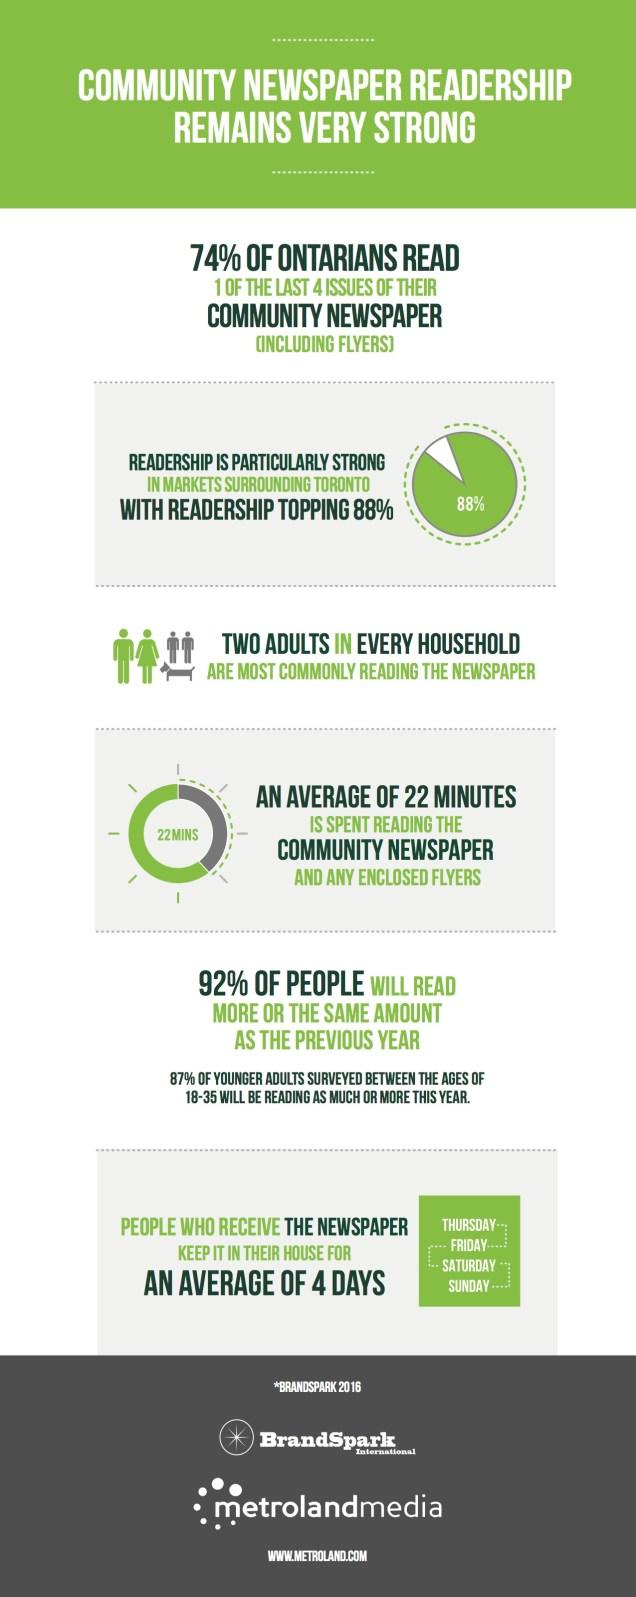 Community-Newspaper-Infographic-2016